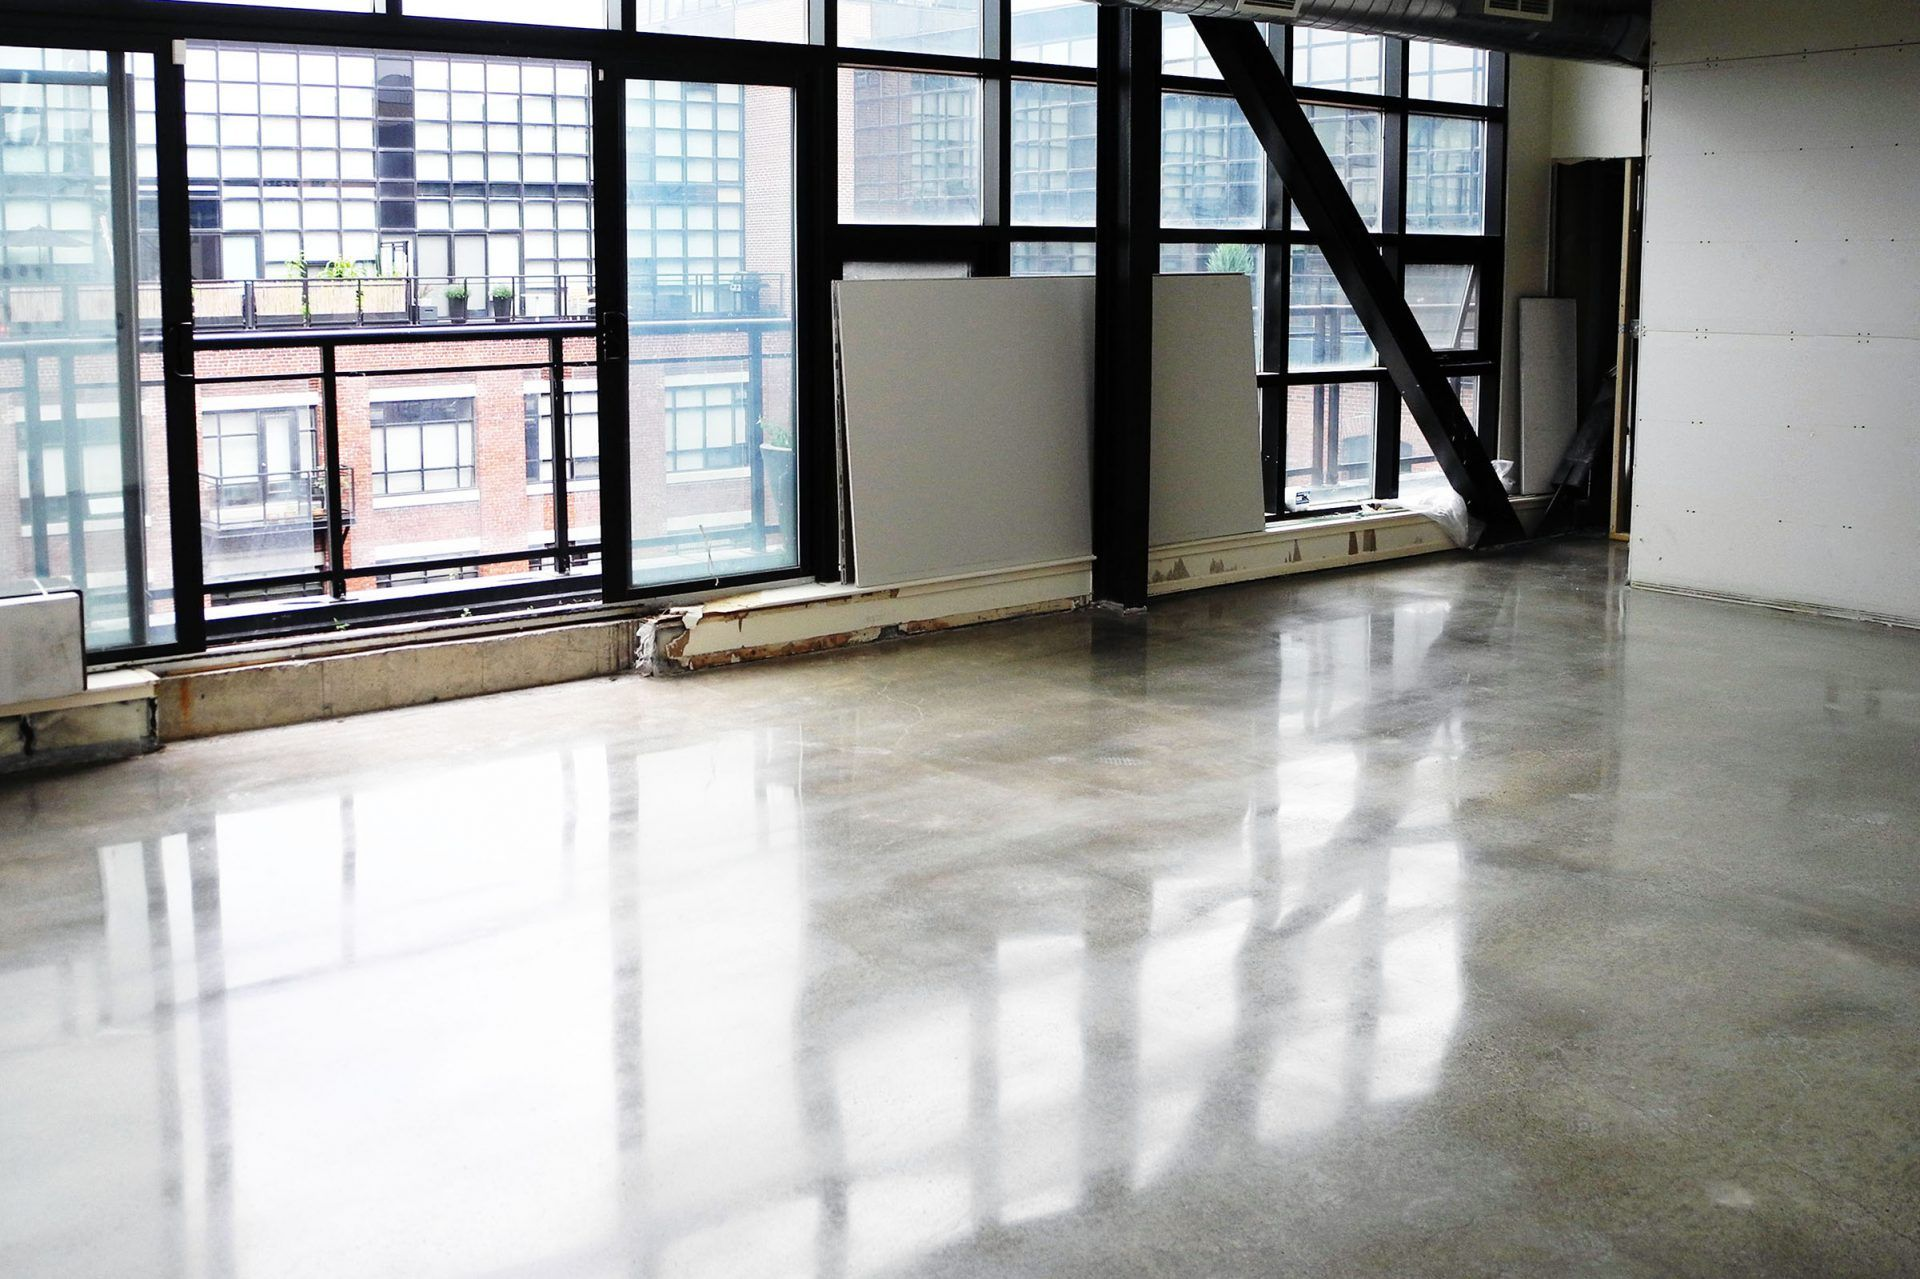 Polished Concrete Flooring In A Toronto Condo Polished Concrete Flooring Concrete Floors Residential